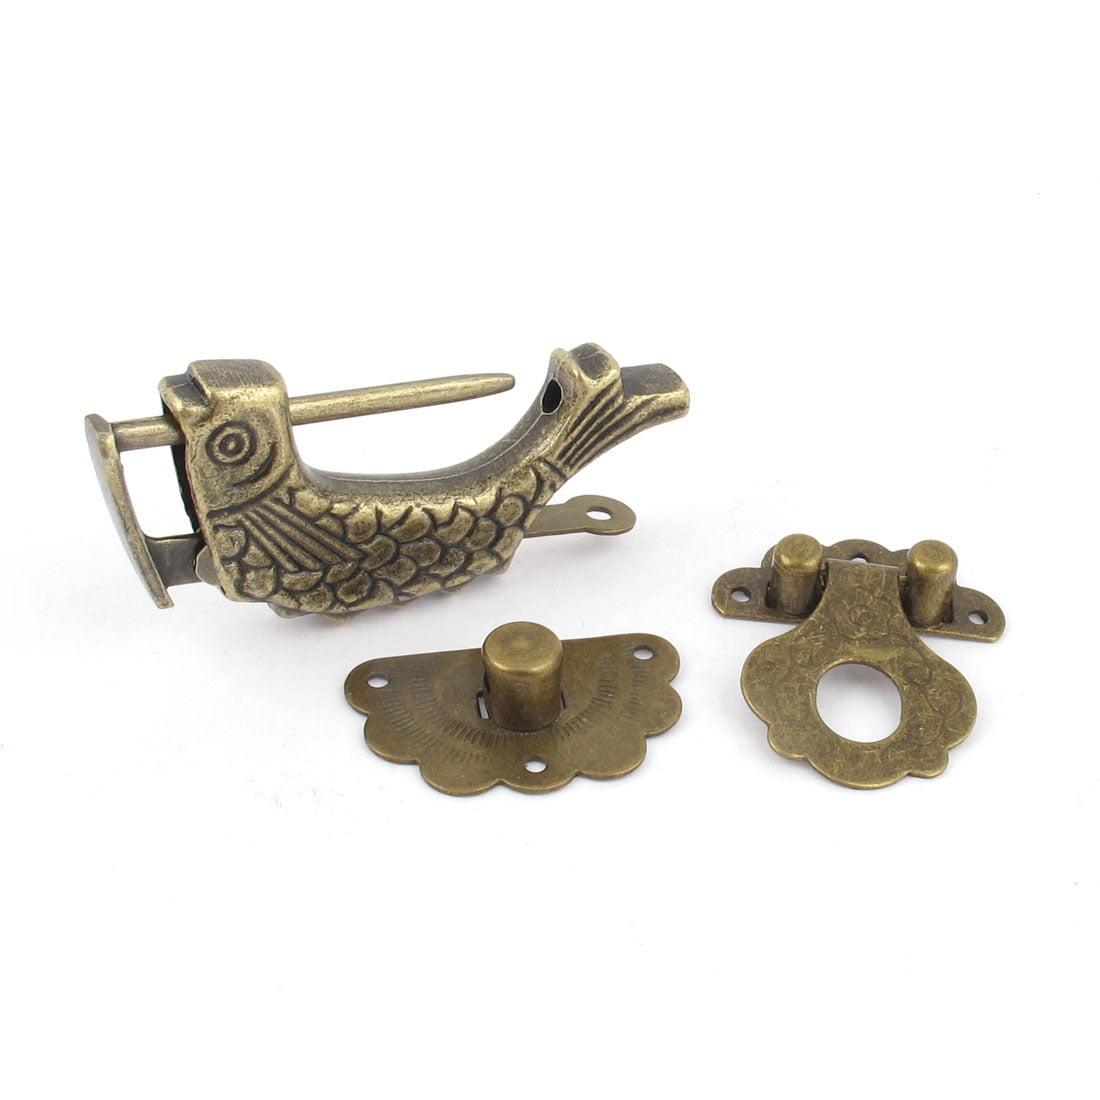 Unique Bargains Metal Fish Shaped Chinese Padlock Lock Key Toggle Latch Clasp Set Bronze Tone